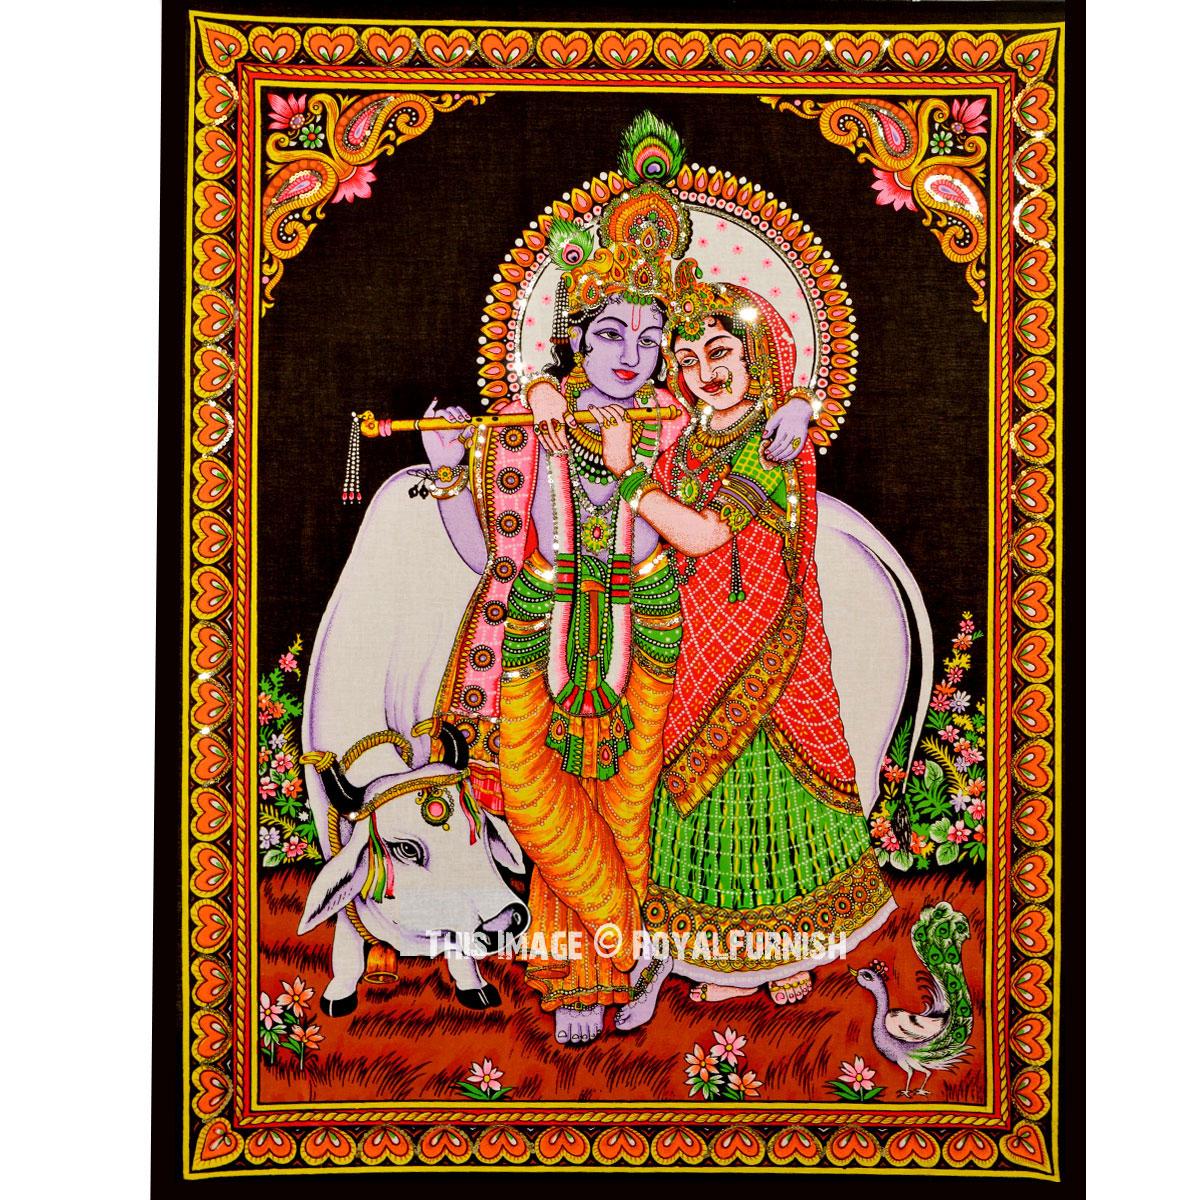 Fabric Wall Posters : Hindu radha krishna divine love fabric cloth poster wall